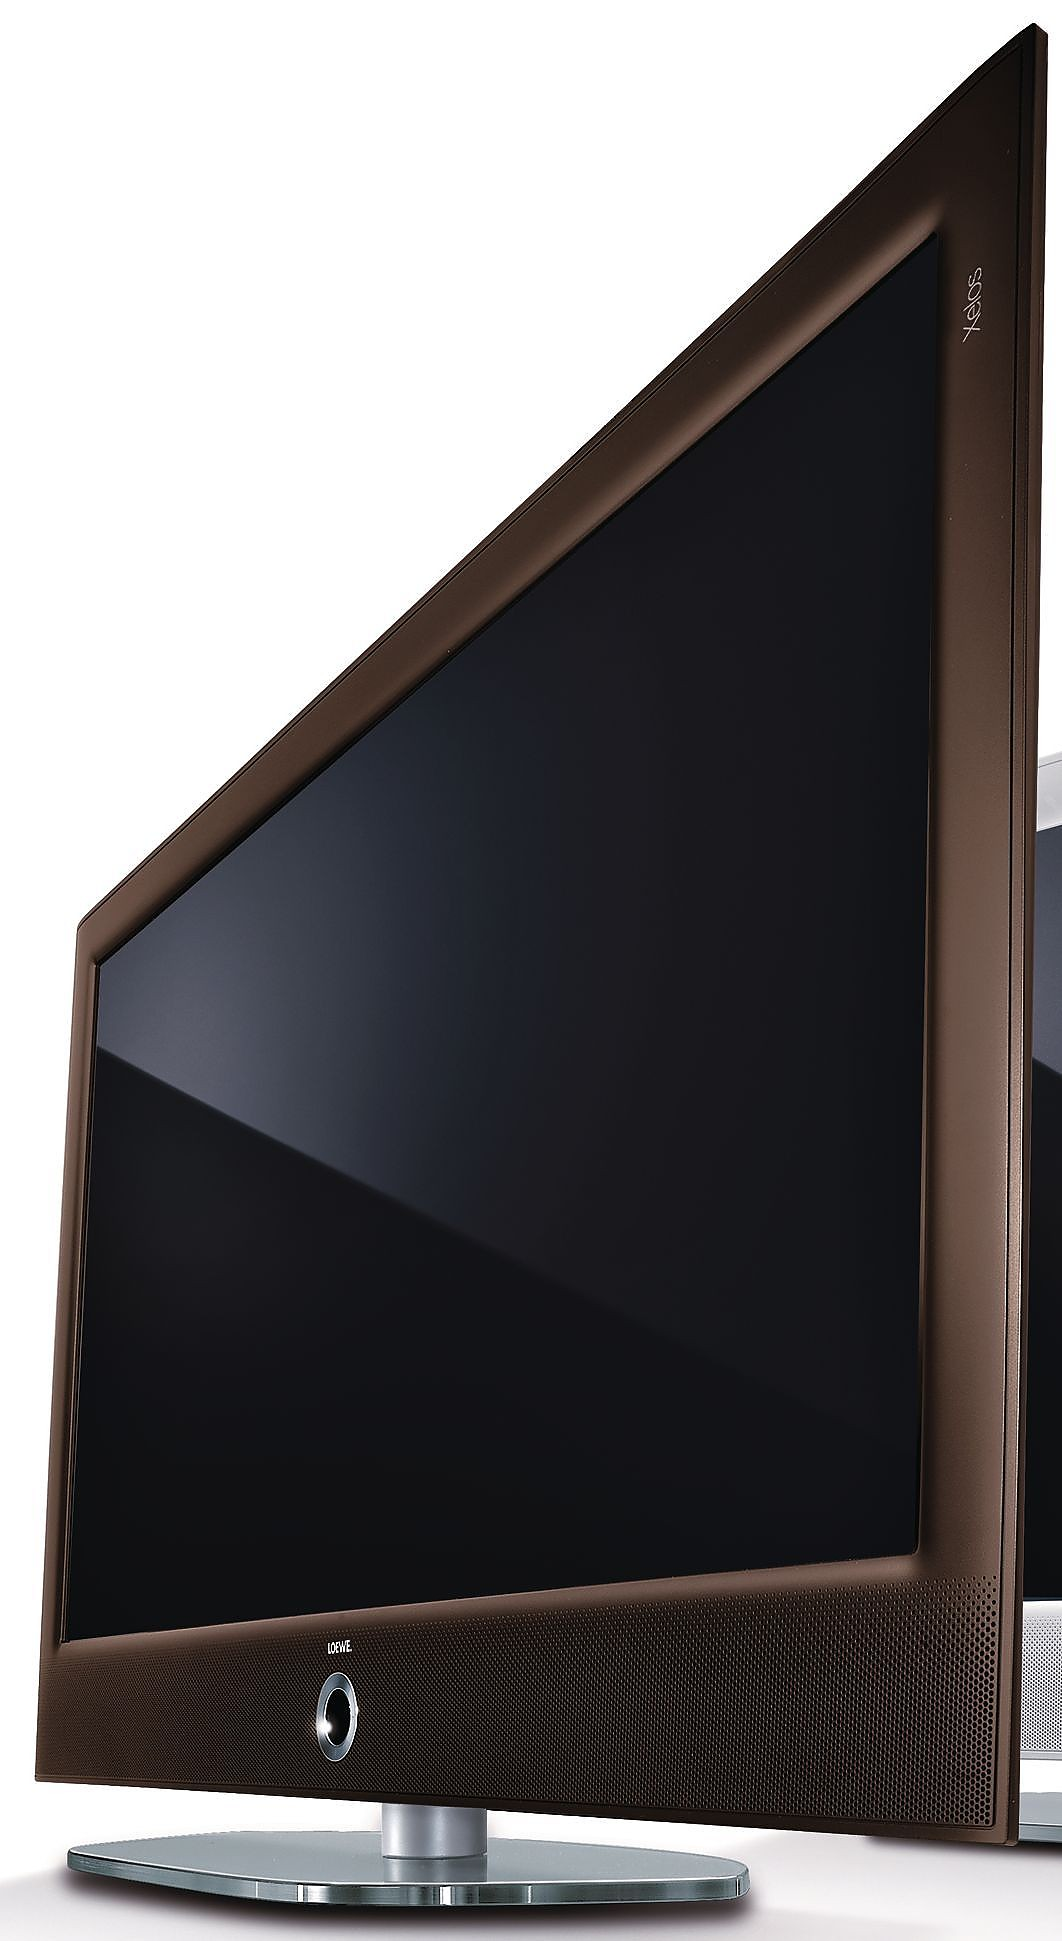 teamsix xelos 40 mocca loewe normal 40 43 zoll 101 107cm. Black Bedroom Furniture Sets. Home Design Ideas